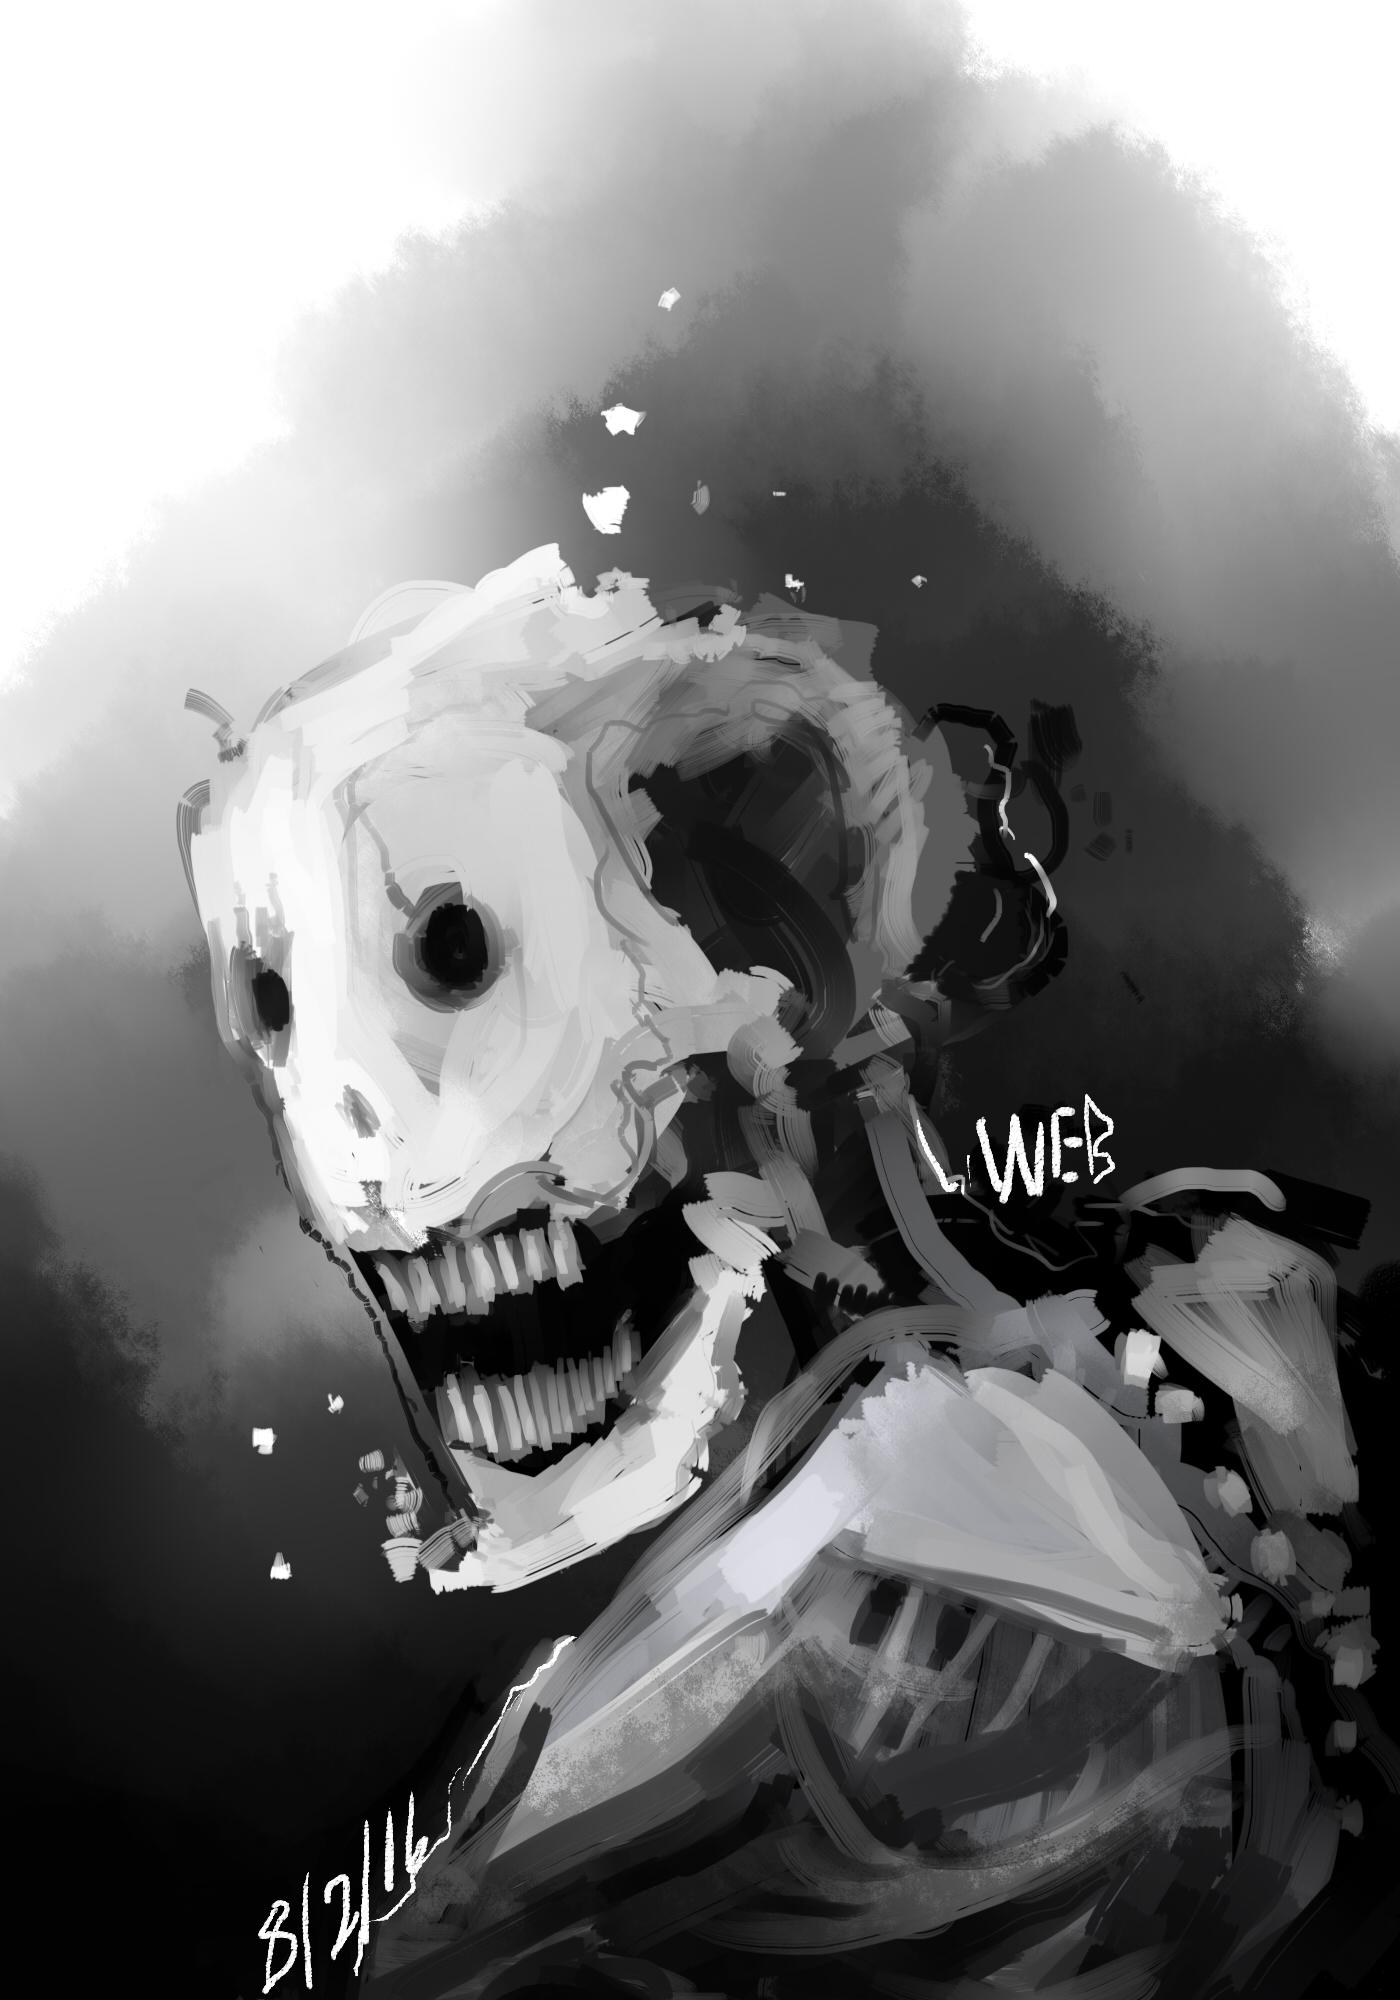 A spooky robot